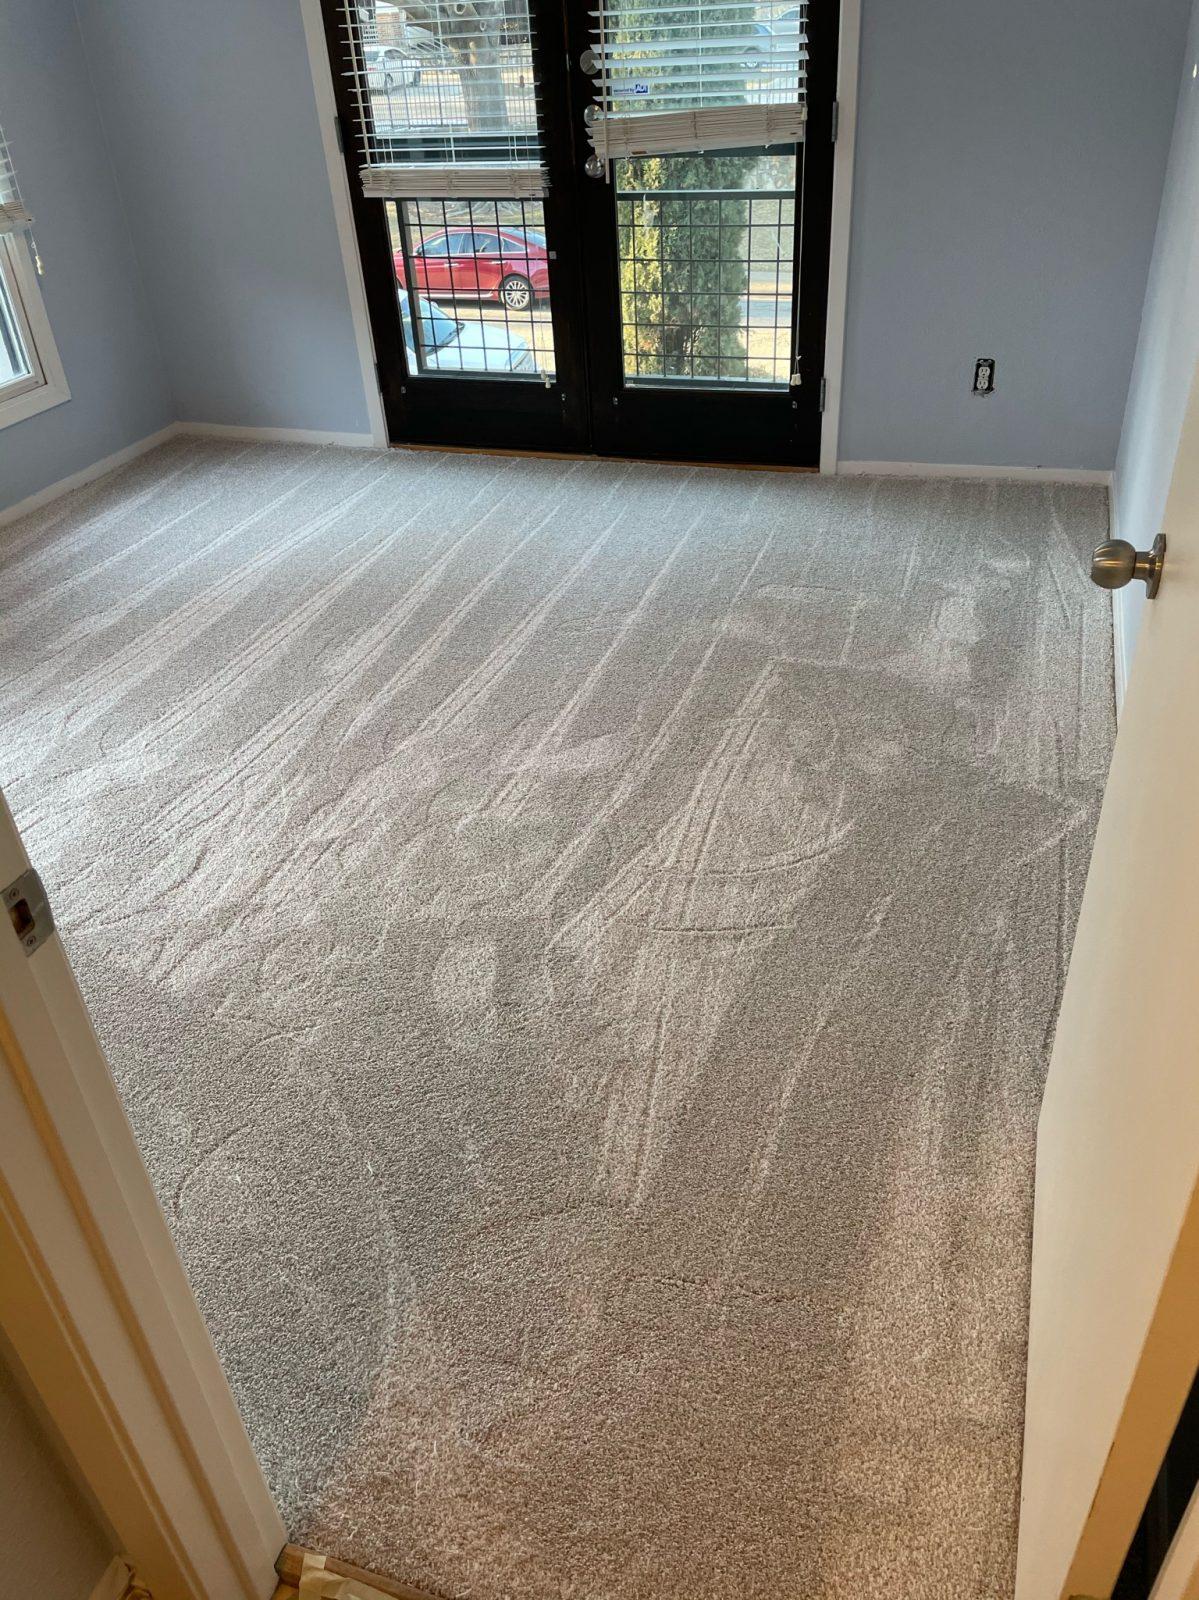 55oz Dreamweaver carpet in porcelain color – Frisco, Texas